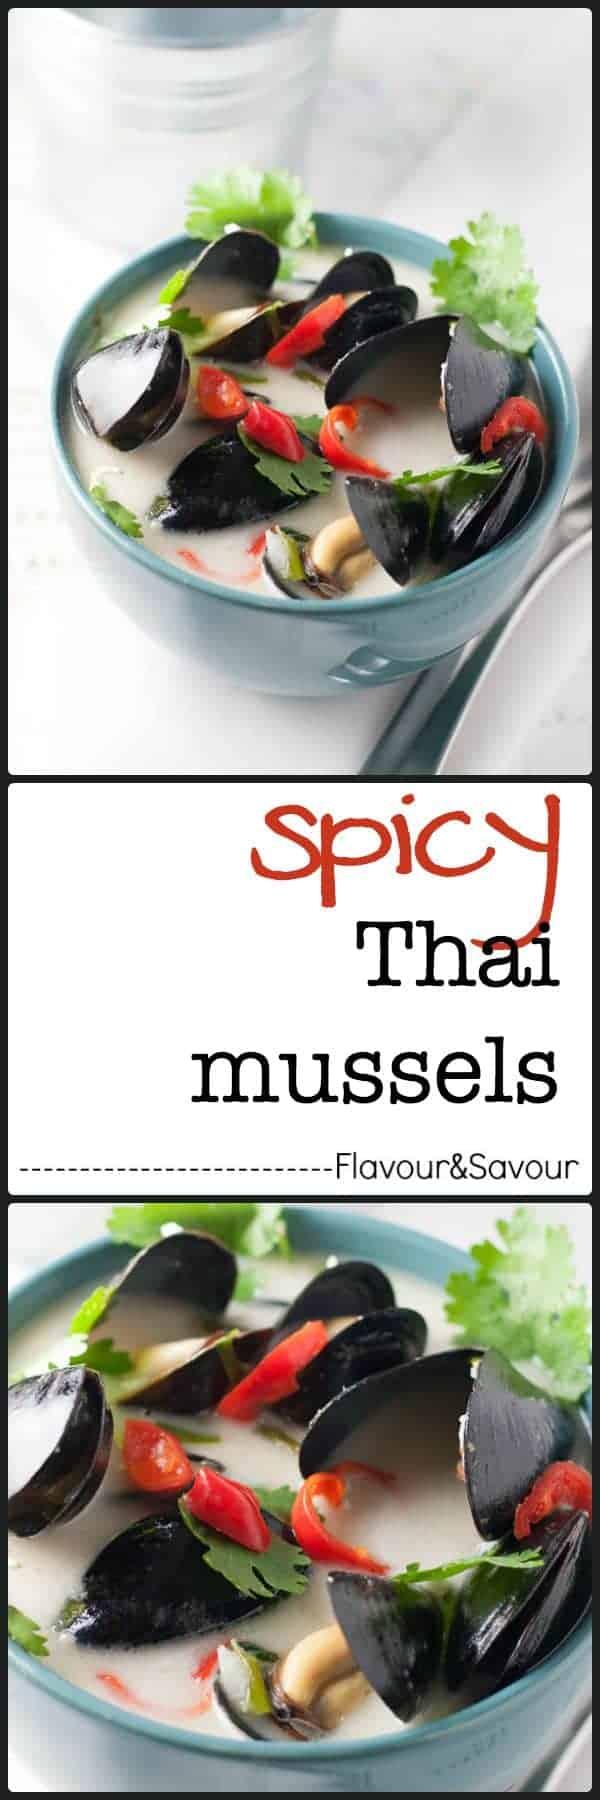 Spicy Thai Steamed Mussels in Coconut Milk |www.flavourandsavour.com